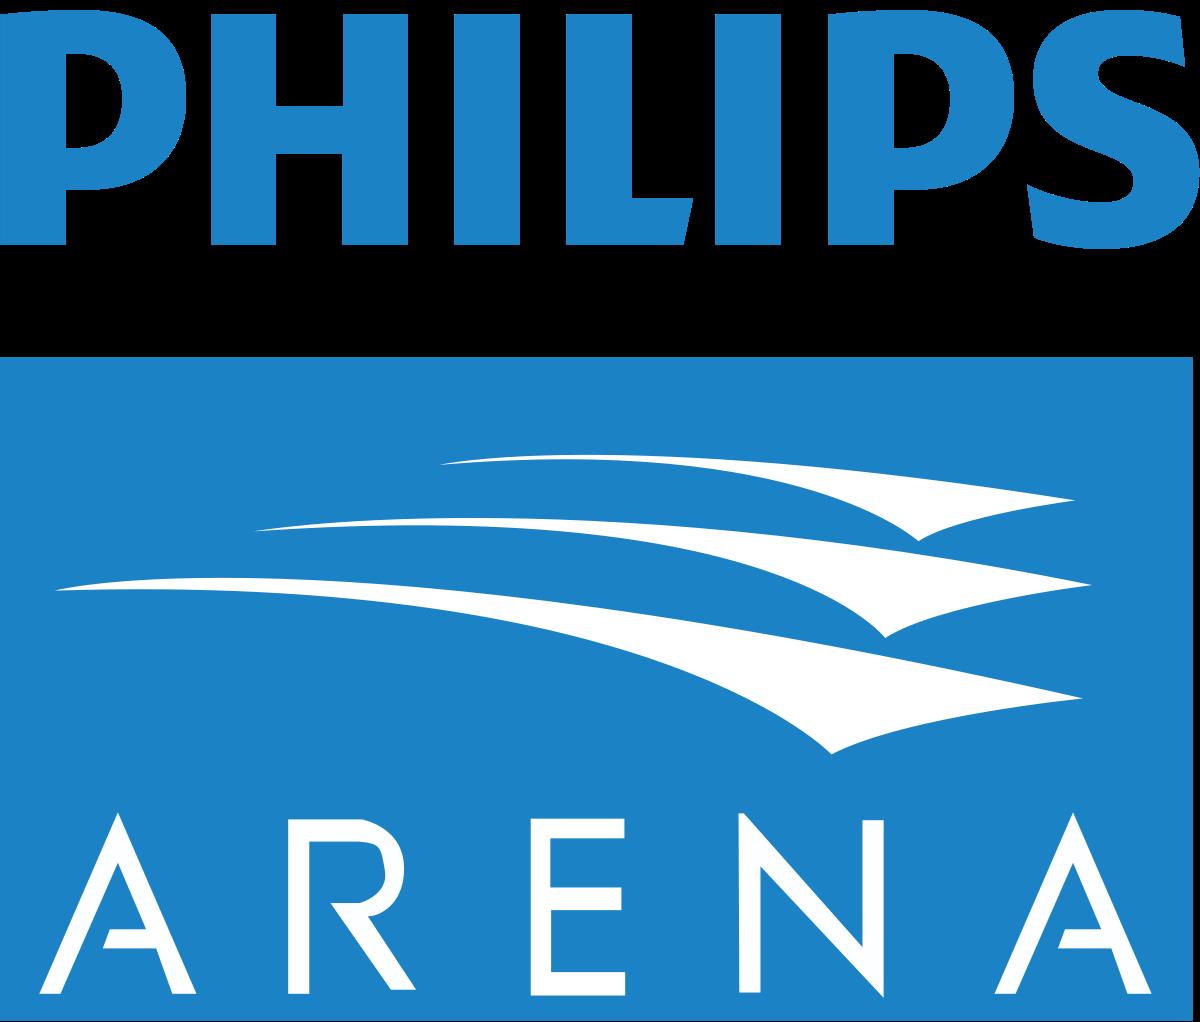 Arena Logo PNG - 29003